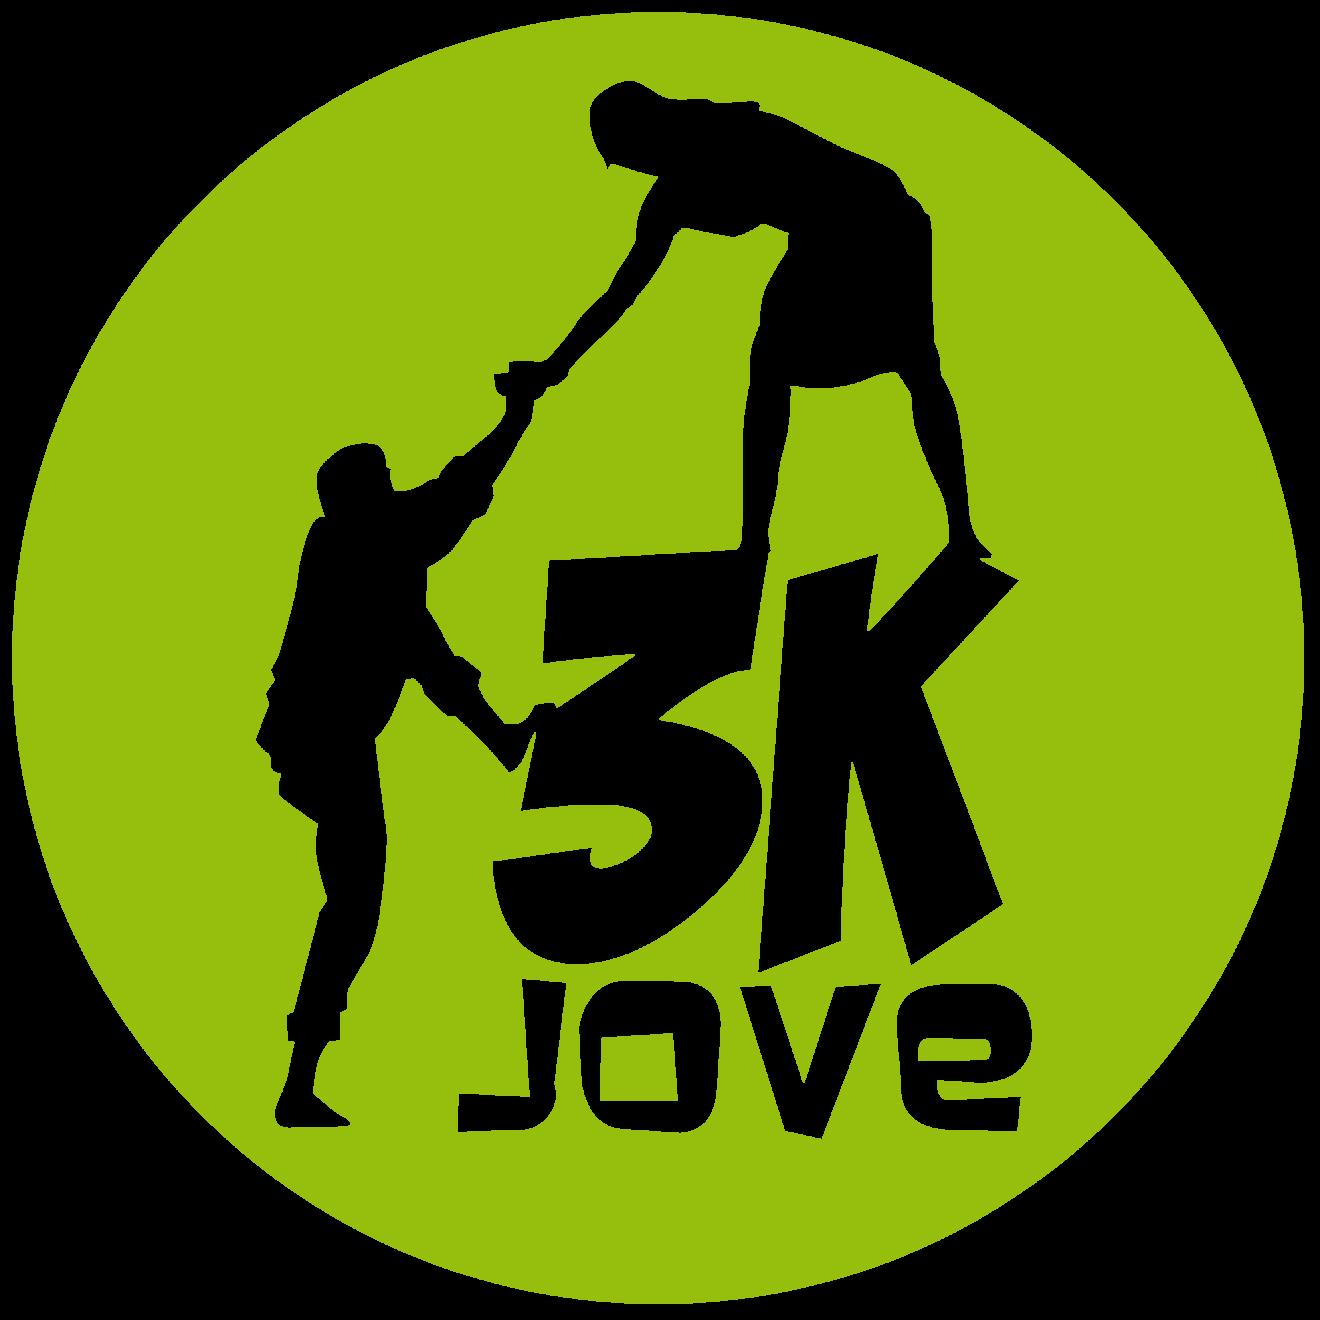 Logo_3K_Jove_ALTA_Defi_GRAN_VERD